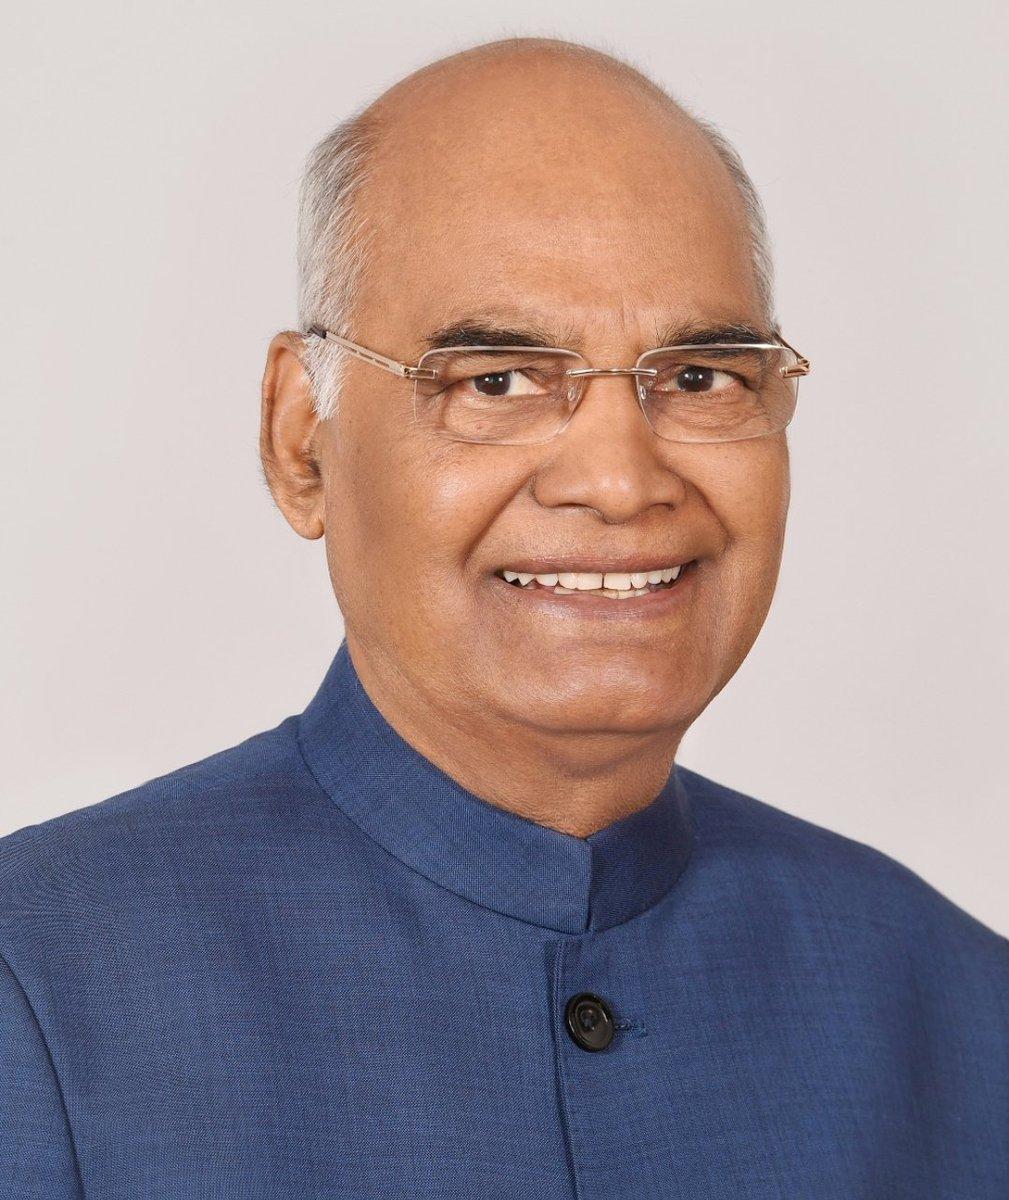 It is a significant move. We are very grateful to honble @rashtrapatibhvn for his kind blessings to @NMANEWDELHI seminar on #FounderKingOfDelhi #AnangPalTomarII @PMOIndia @MinOfCultureGoI @ICCR_Delhi @msignca @DelhiAsi @ASIGoI @rameshbidhuri @MEAIndia @M_Lekhi @p_sahibsingh